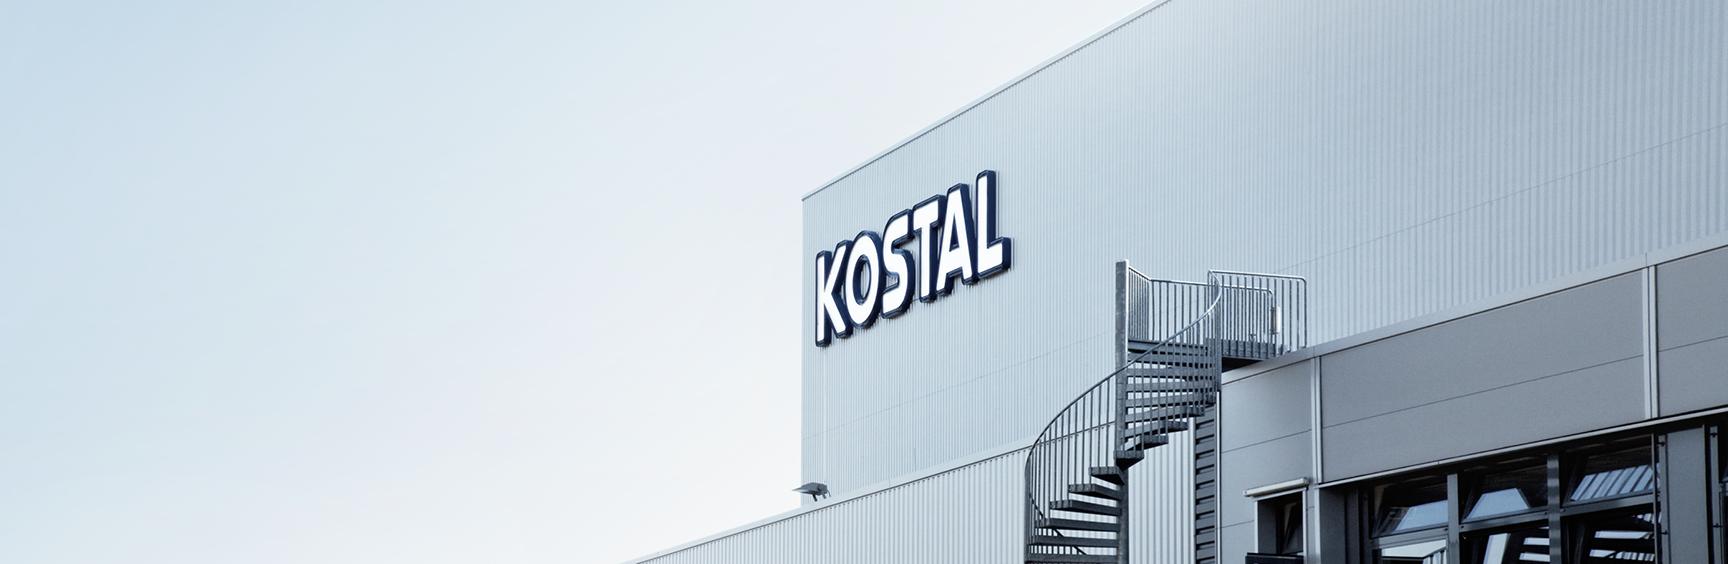 KOSTAL Group